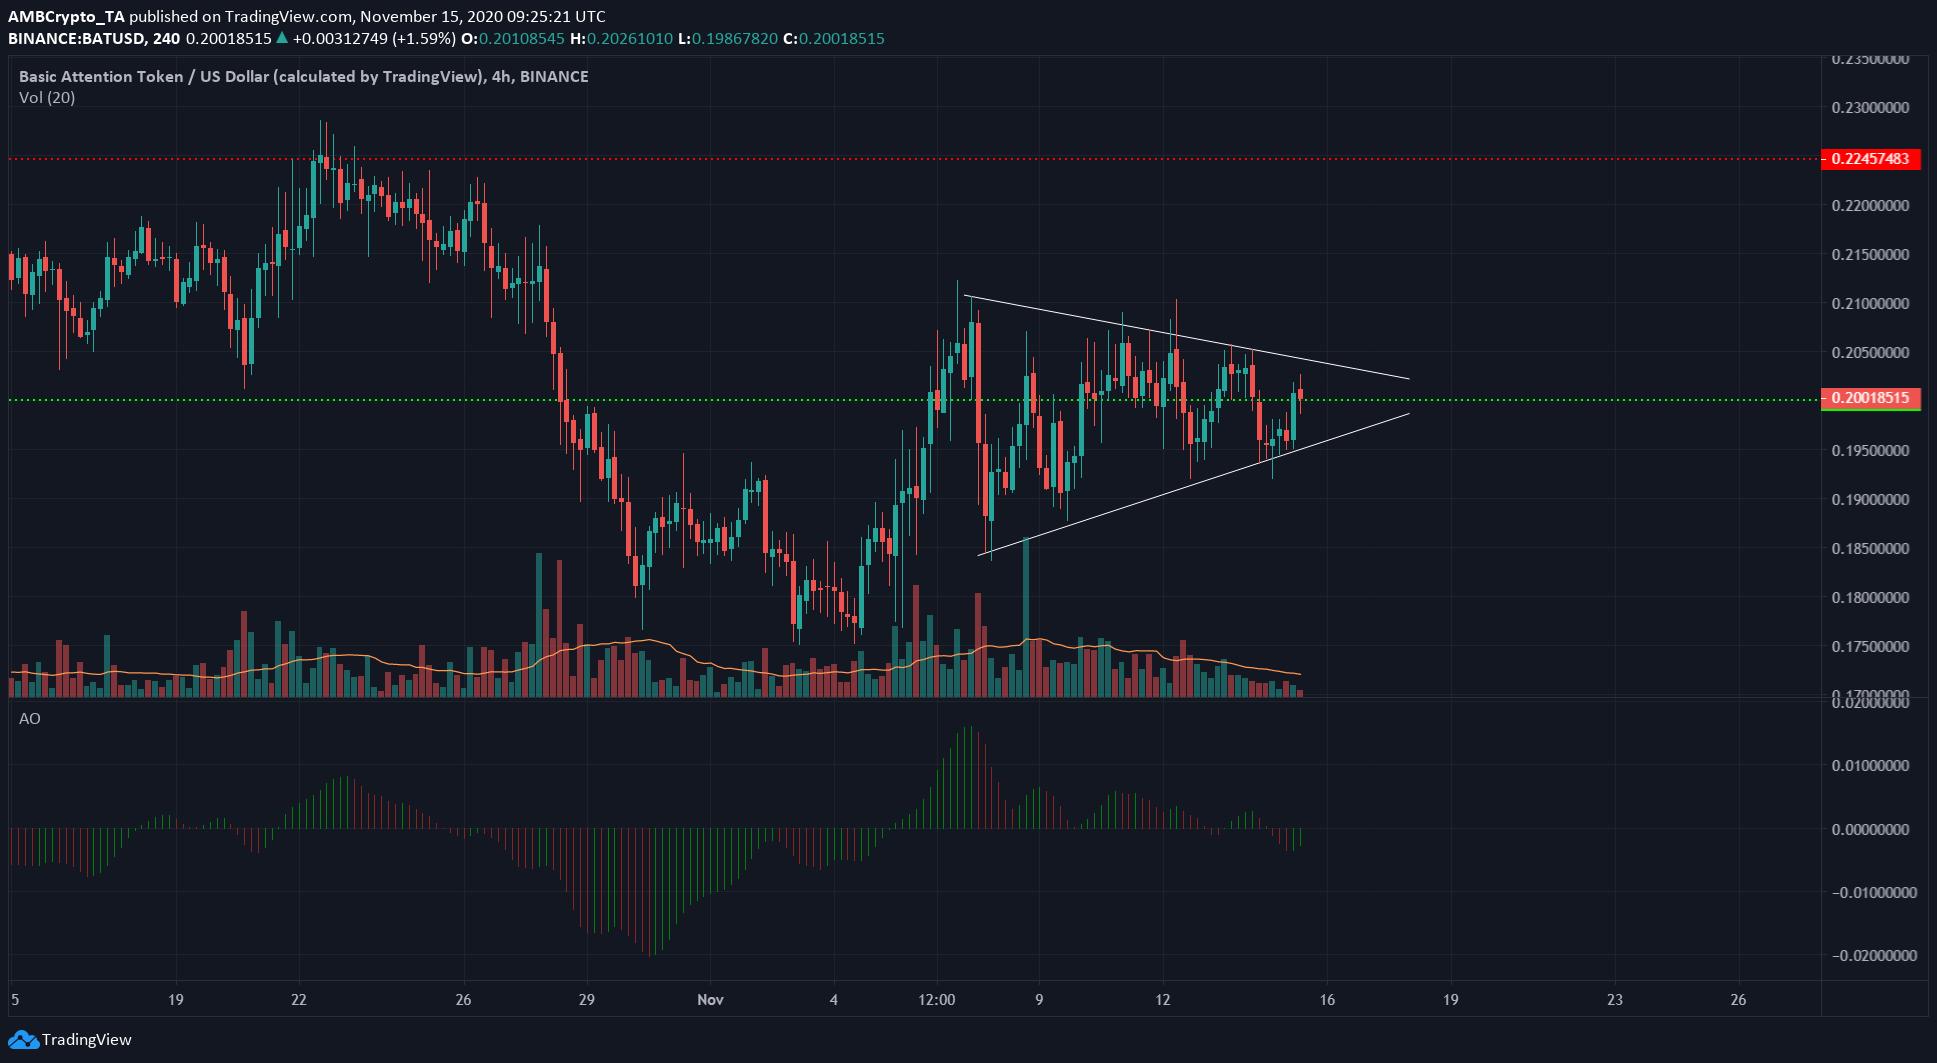 Monero, BAT, Crypto.com Coin Price Analysis: 15 November